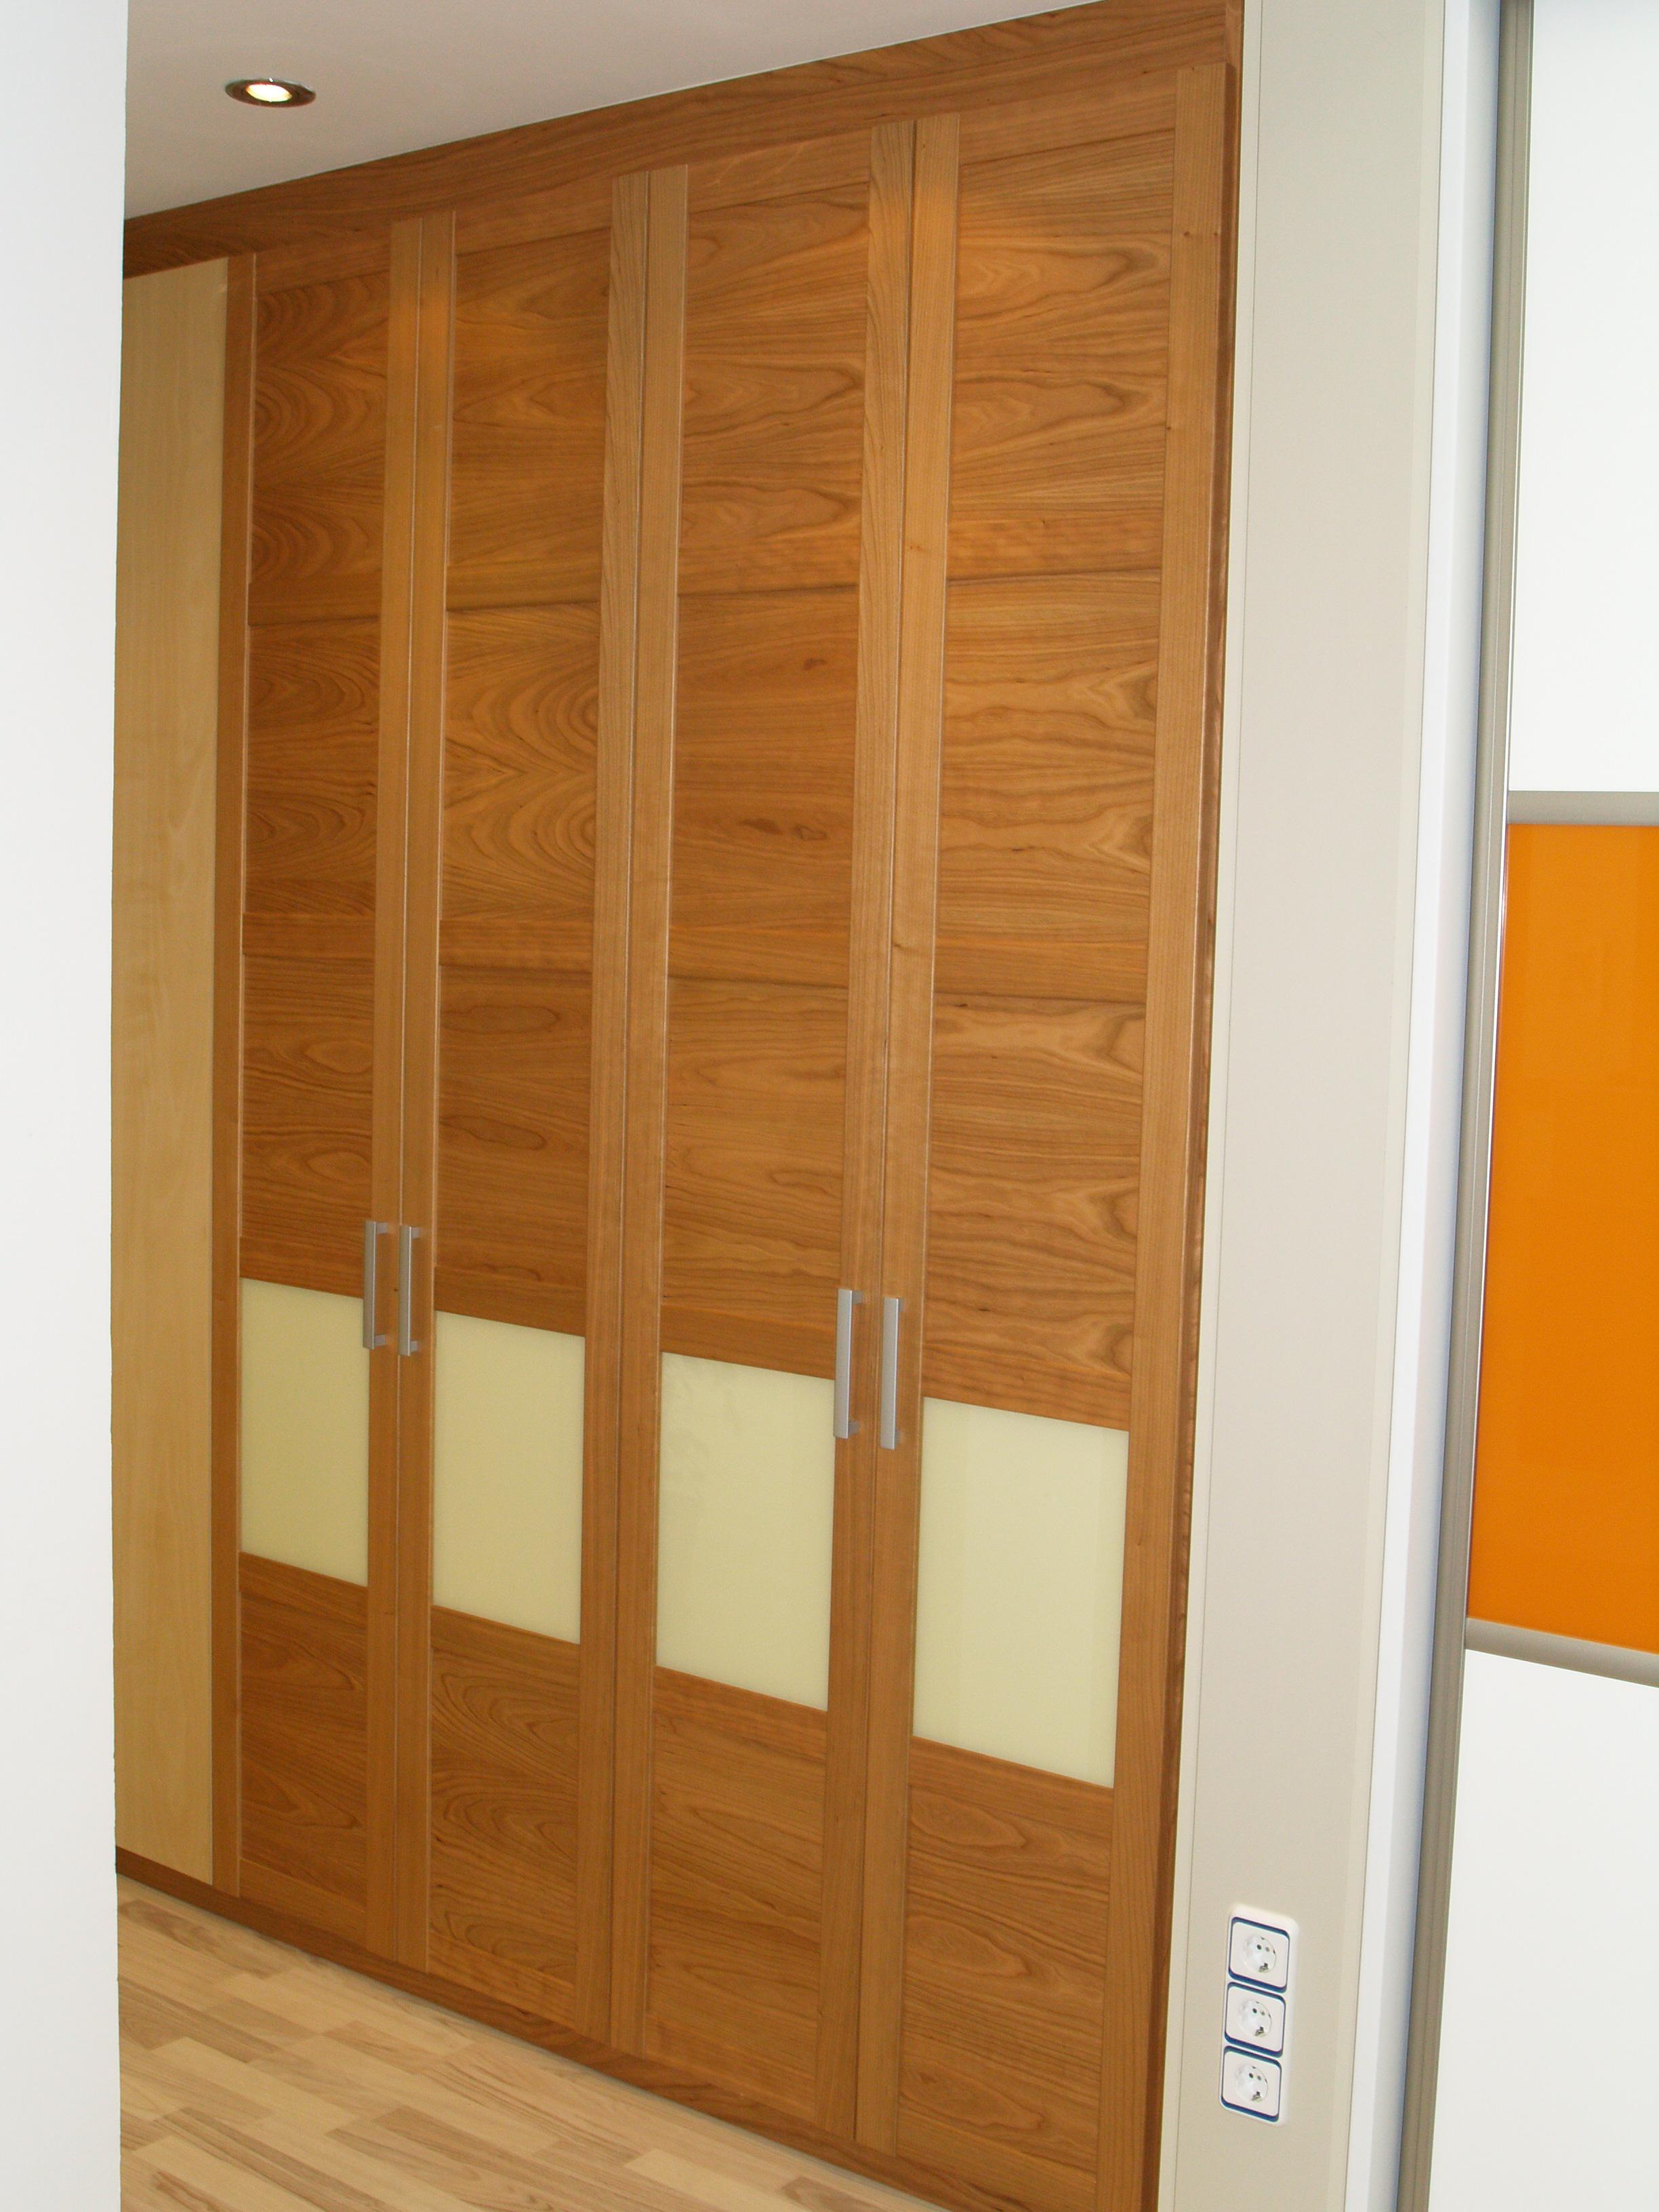 Armarios empotrados con puertas correderas o abatibles - Puertas correderas armarios empotrados ...